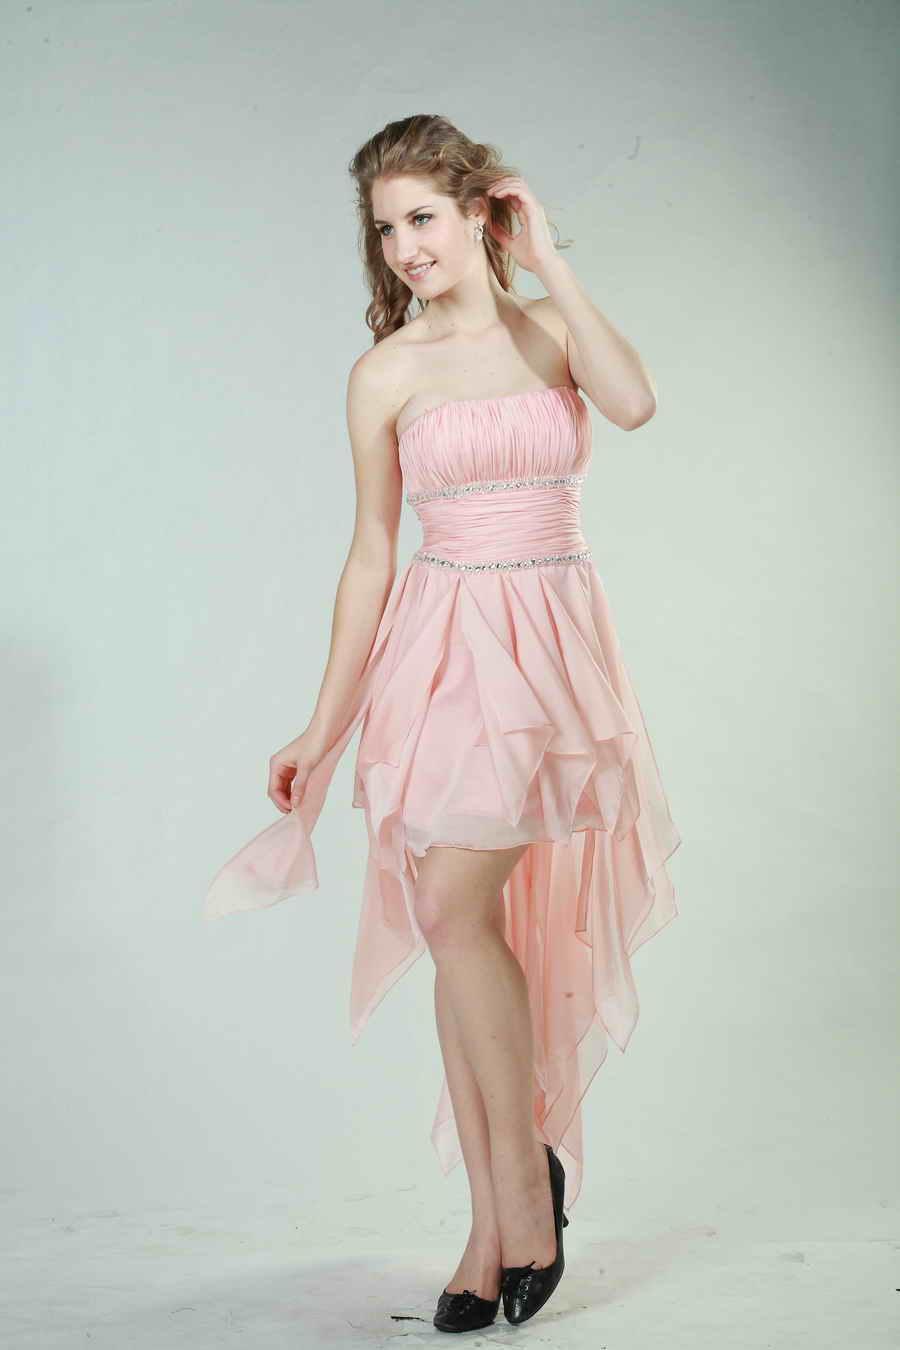 Pics of pink bridesmaid dresses wedding dress shops pics of pink bridesmaid dresses 99 ombrellifo Choice Image